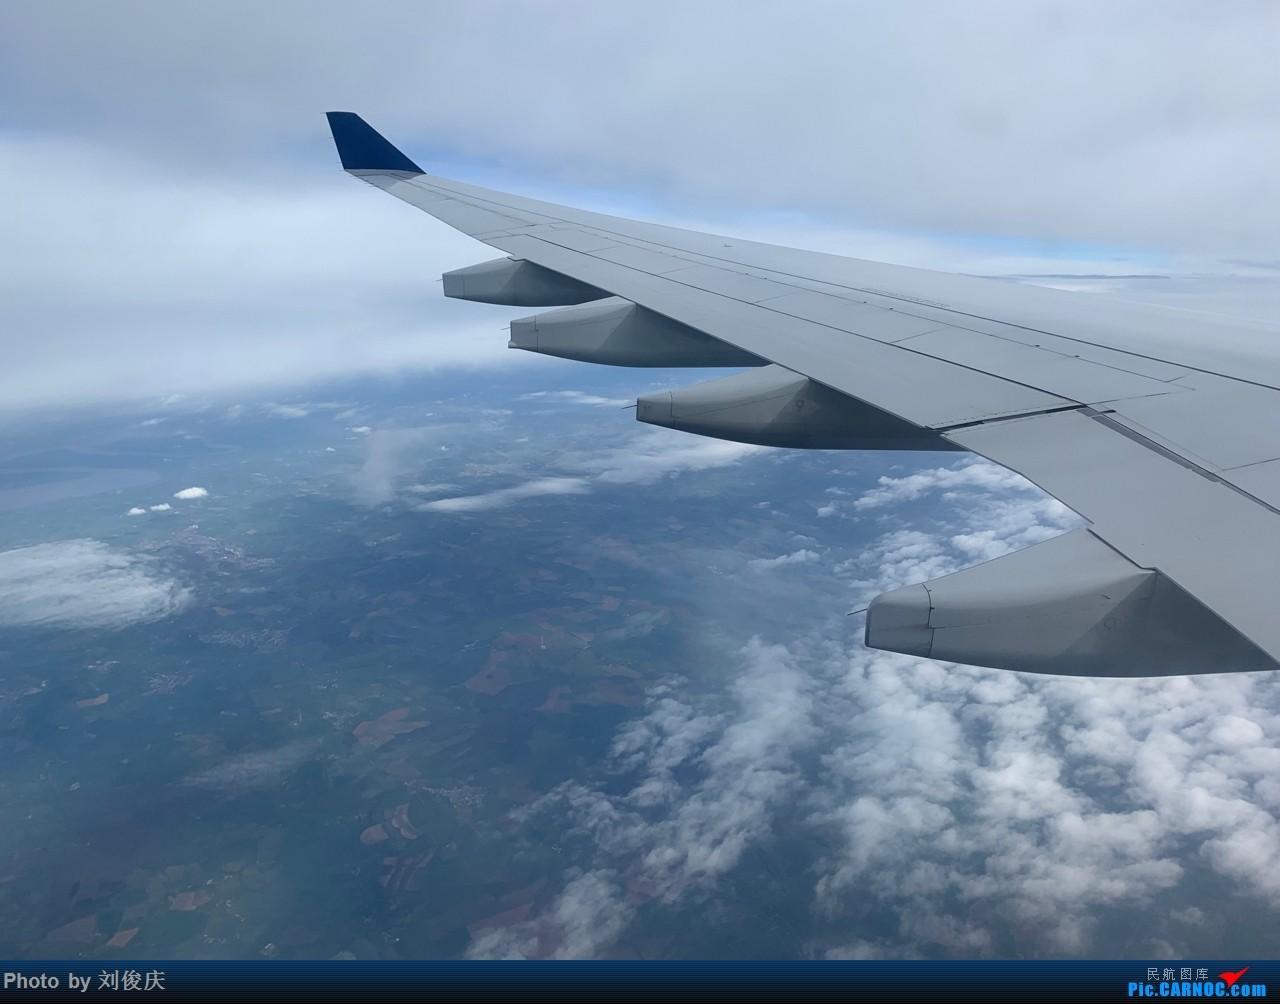 Re:[原创]SEA-JFK-LHR-CDG-FCO-CDG-LHR-ATL-SEA 8天3国5城暴走游记 [更新至JFK] AIRBUS 330-200  JFK